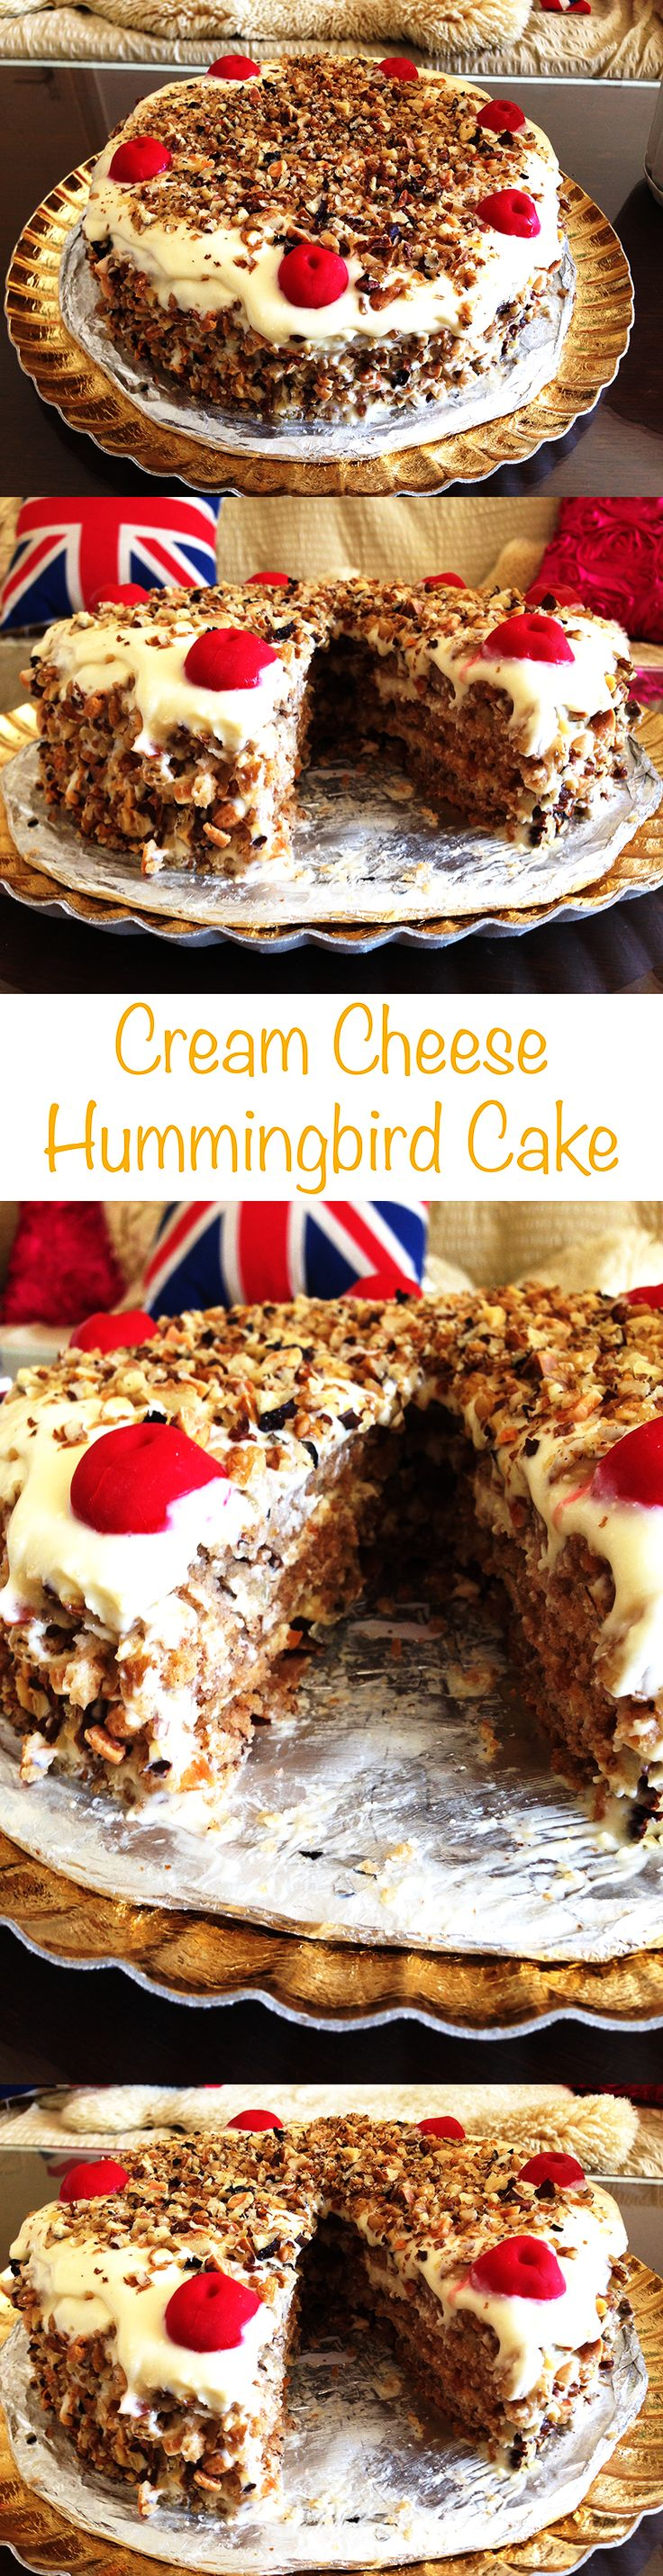 Hummingbird Cake Recipe with Cream Cheese Frosting - Better Baking BibleBetter Baking Bible